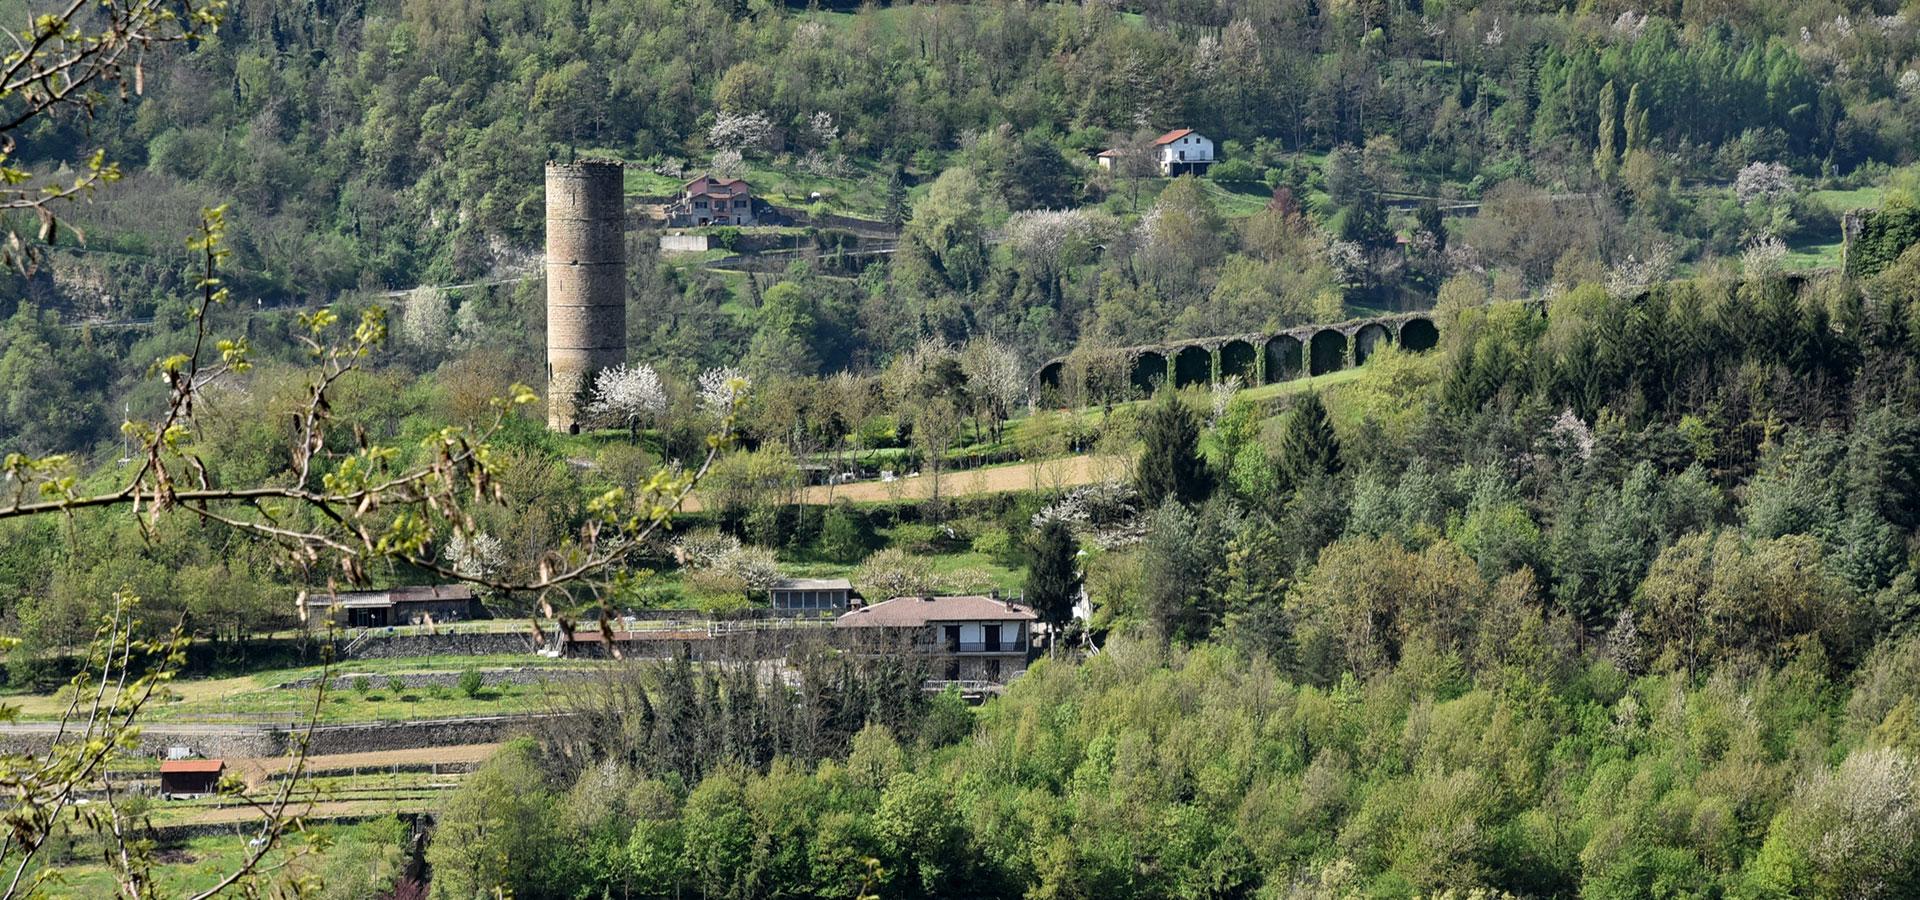 Torre-di-cortemilia-1